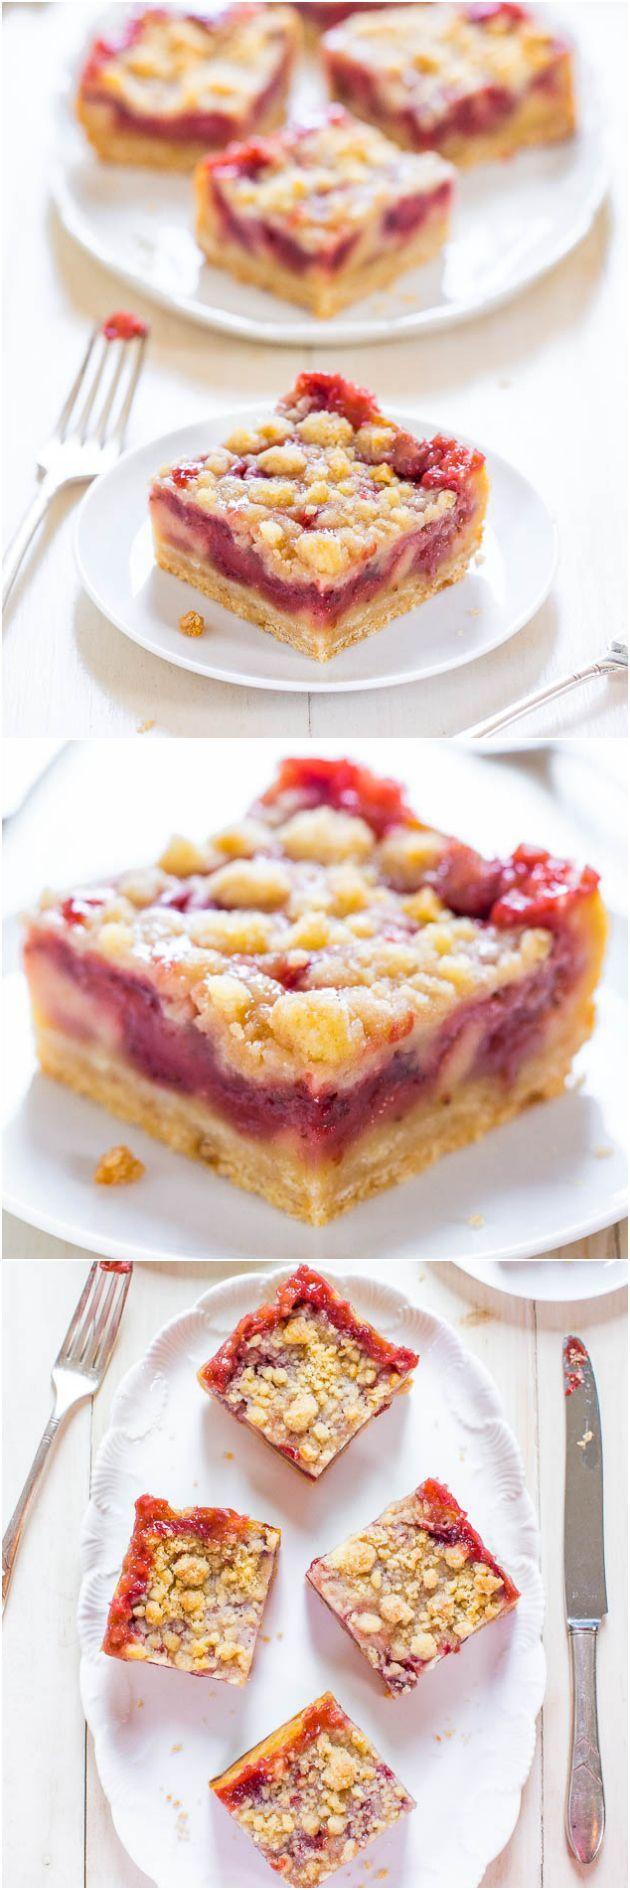 Strawberry Lemonade Bars - Imagine crossing lemon bars with a strawberry pie. These easy bars taste like strawberry lemonade! Sooo good!